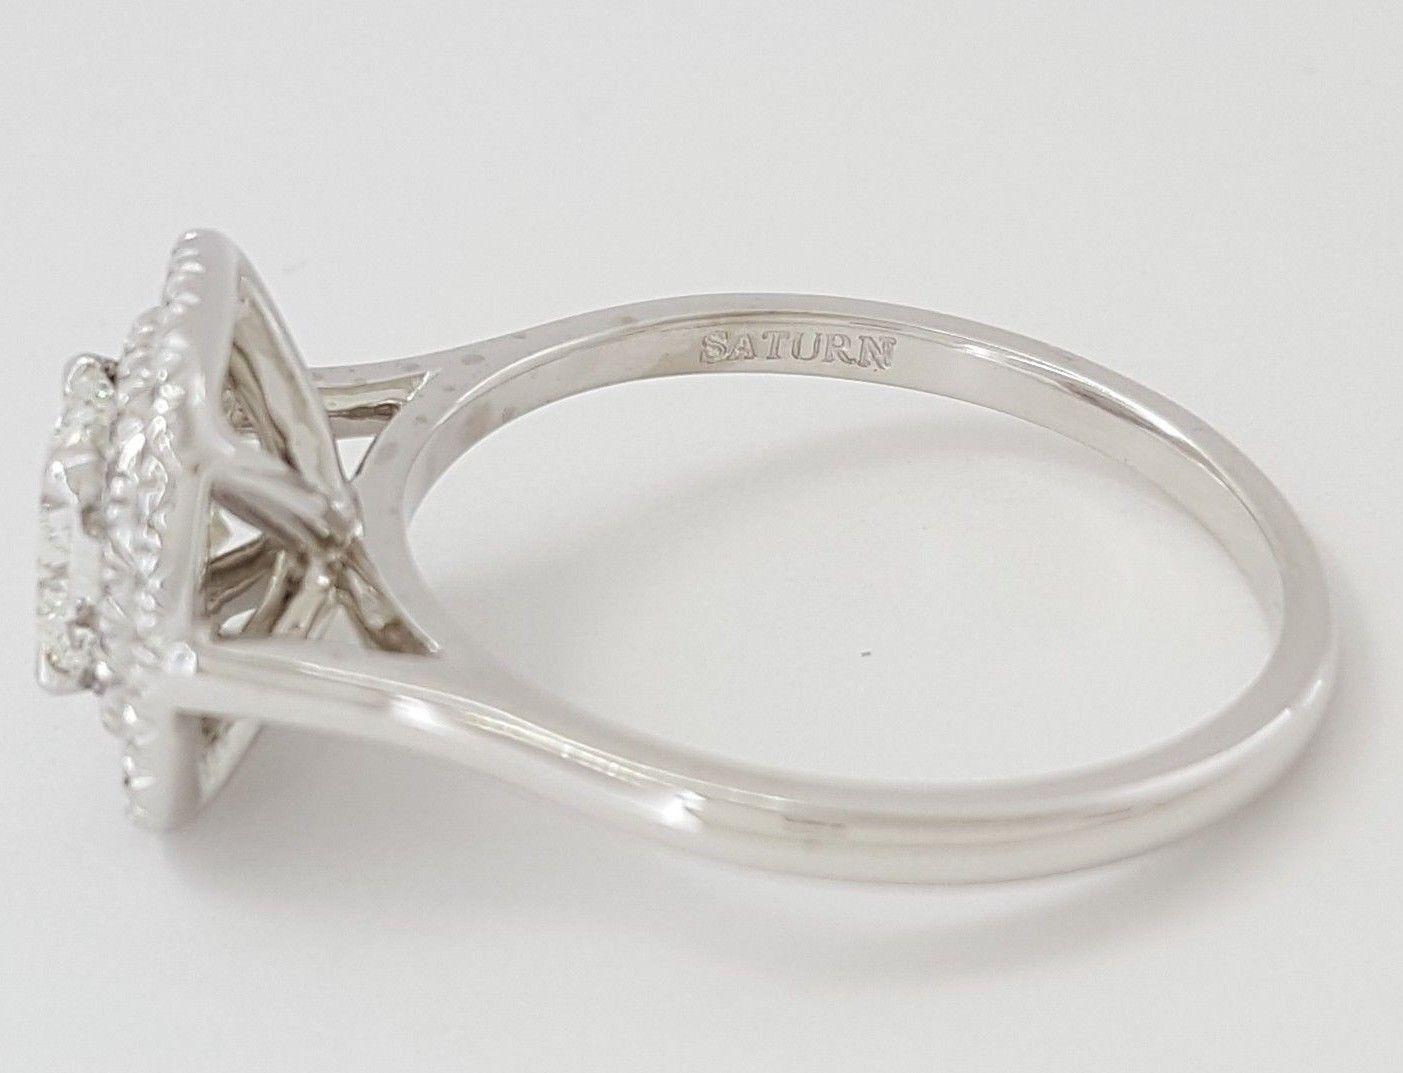 0.97 ct 18K White Gold Cushion Cut Diamond Double Halo Engagement Ring GIA E/VS1 8